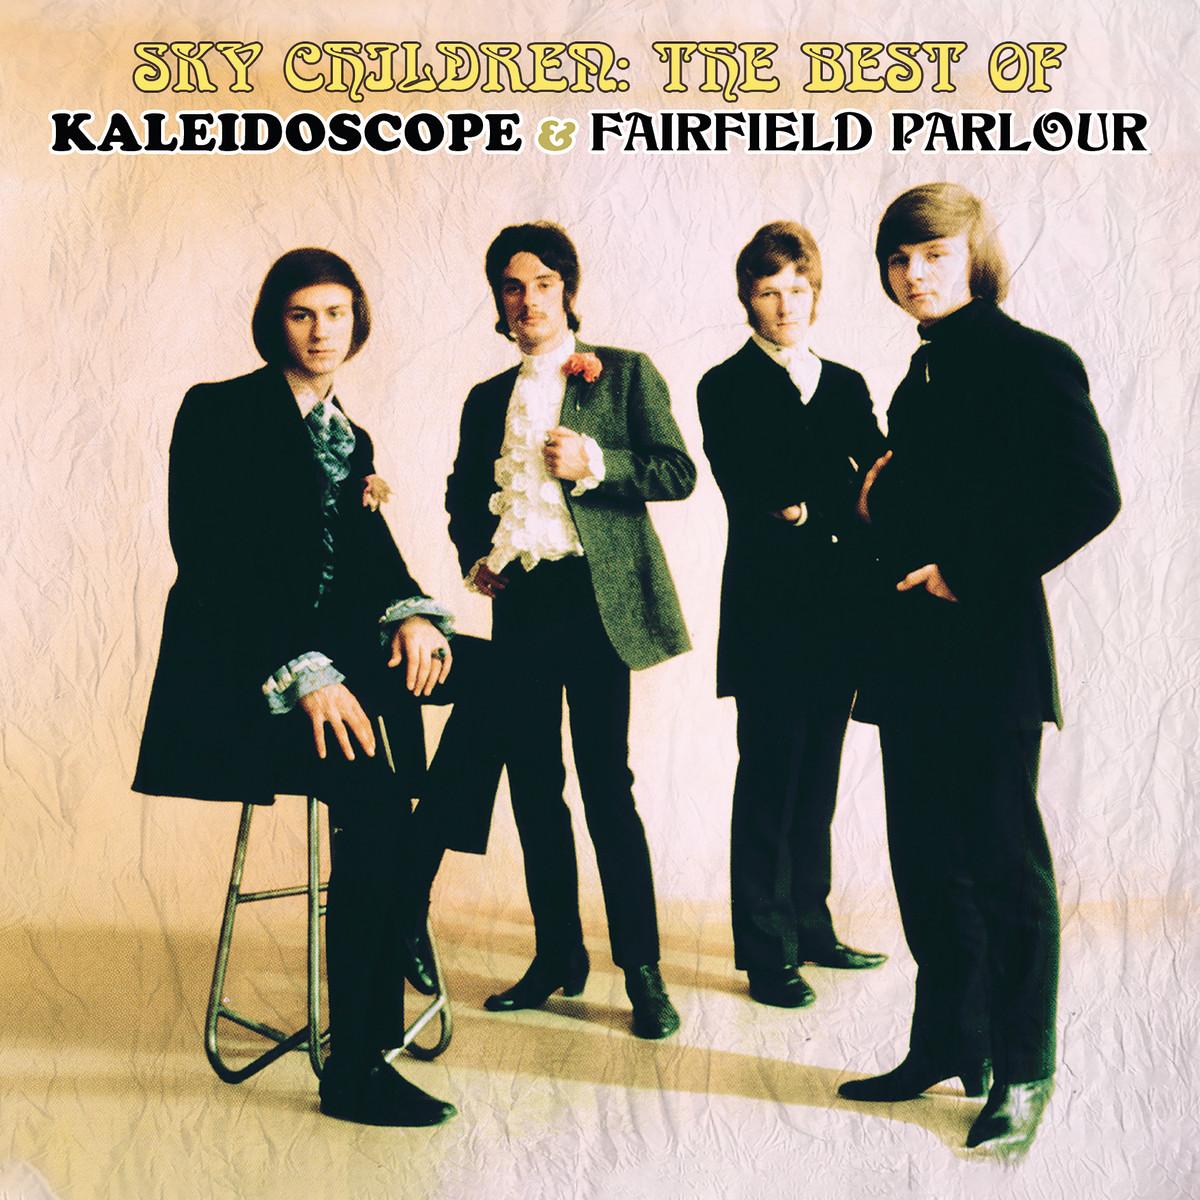 The compilation Sky Children: The Best of Kaleidoscope & Fairfield Parlour